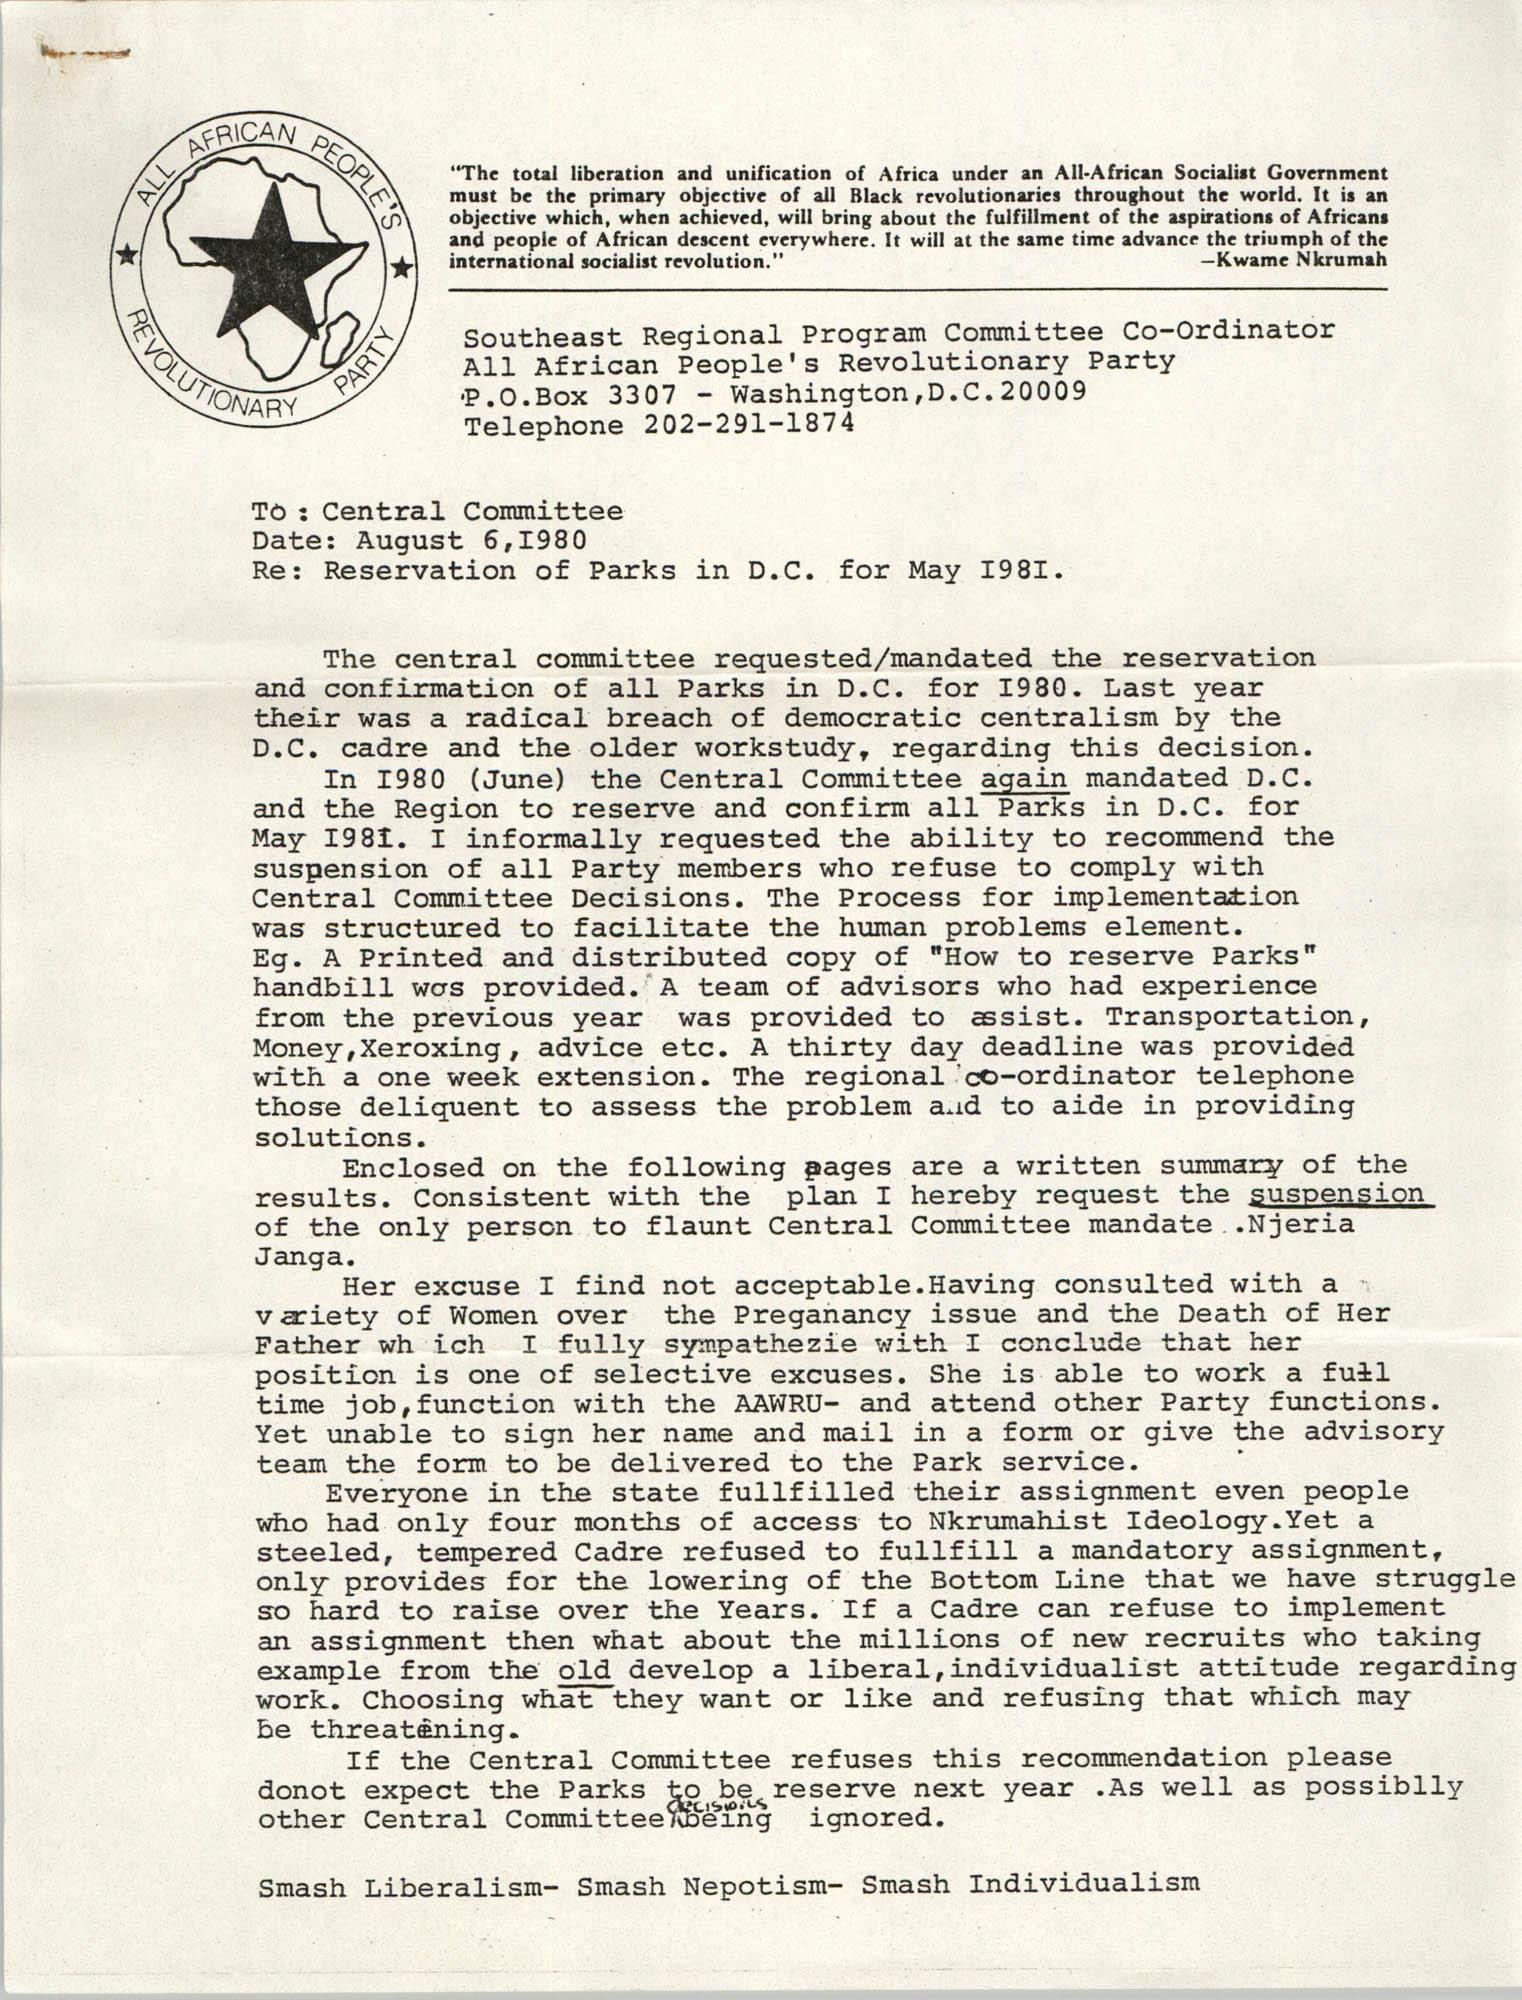 All African People's Revolutionary Party Memorandum, May 1981